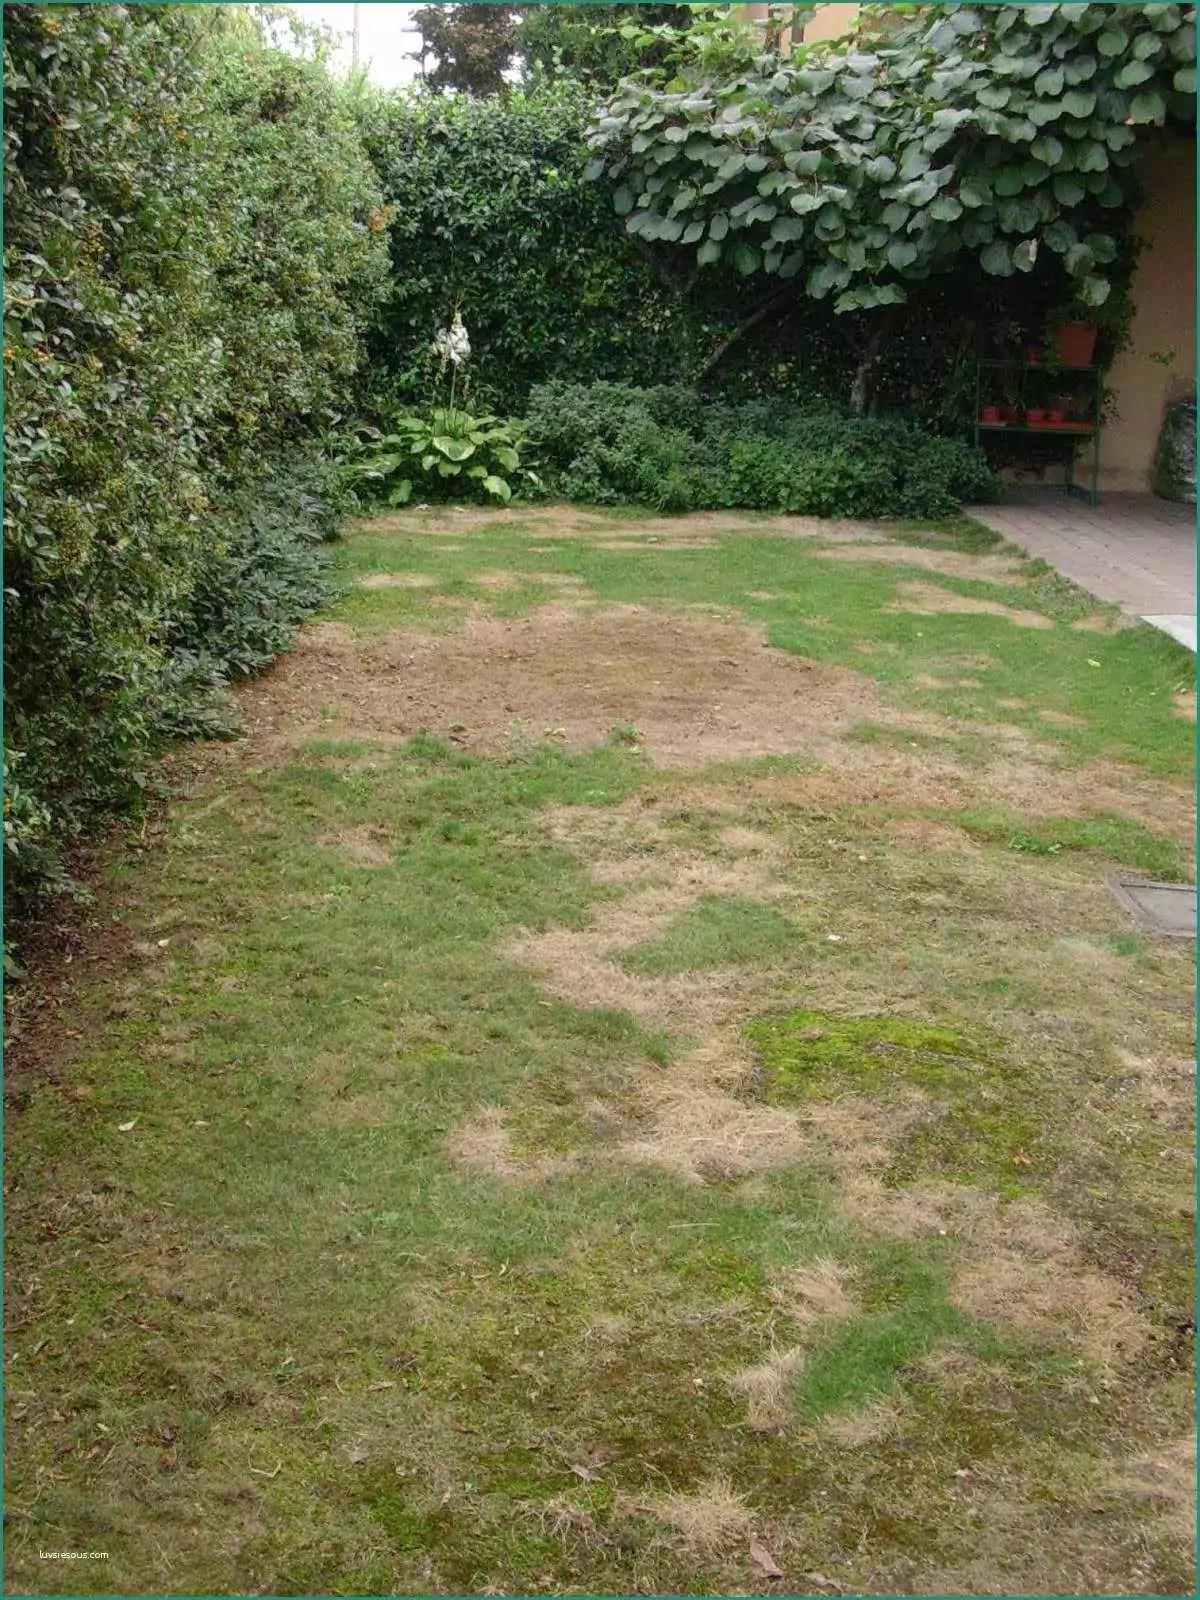 Camminamento Giardino Fai Da Te.Bordure Giardino Fai Da Te Bordura Da Giardino Divisoria Per